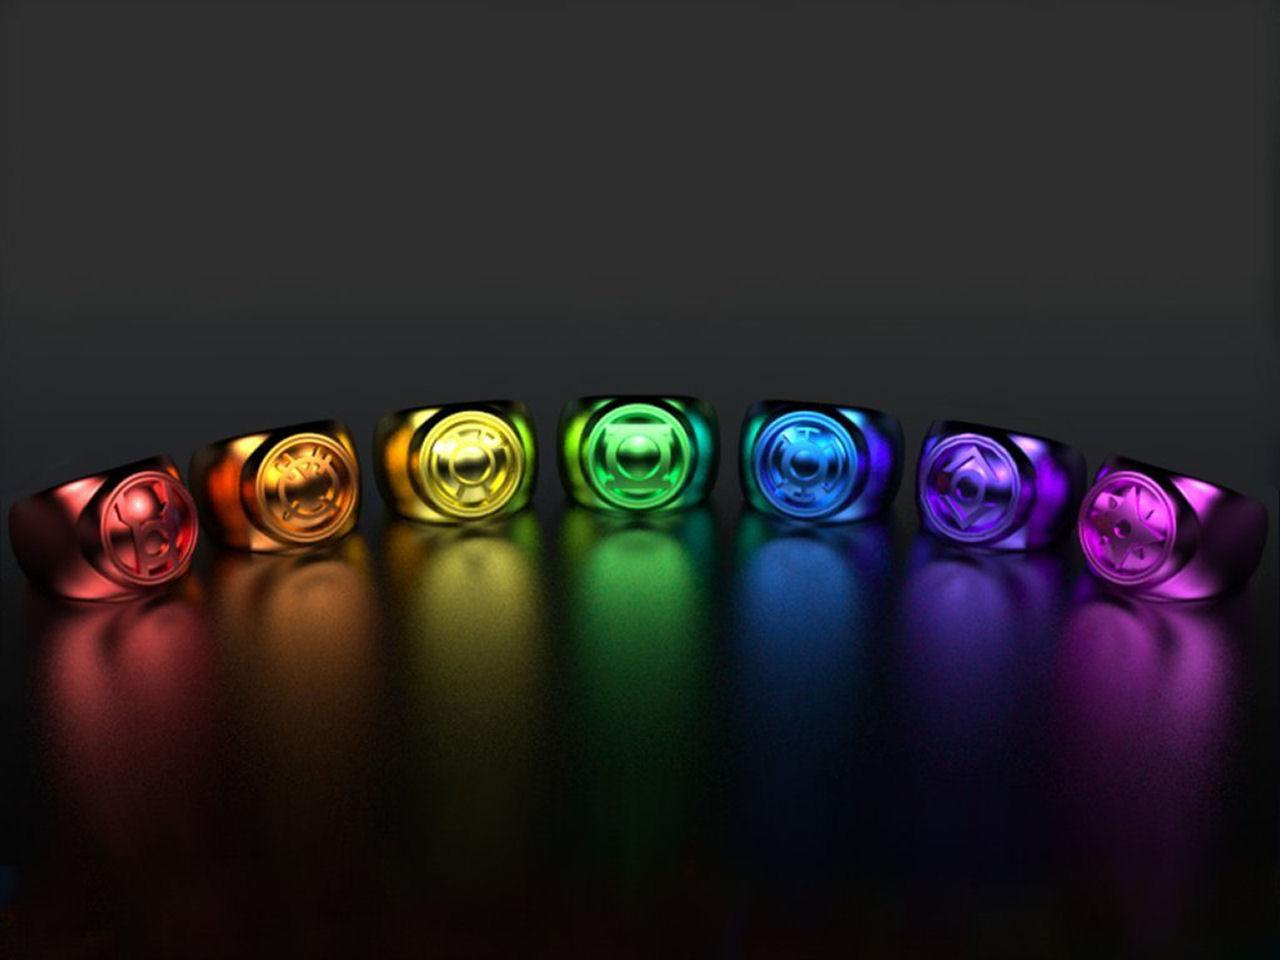 Green Lantern Wallpapers Group 89 1280x960